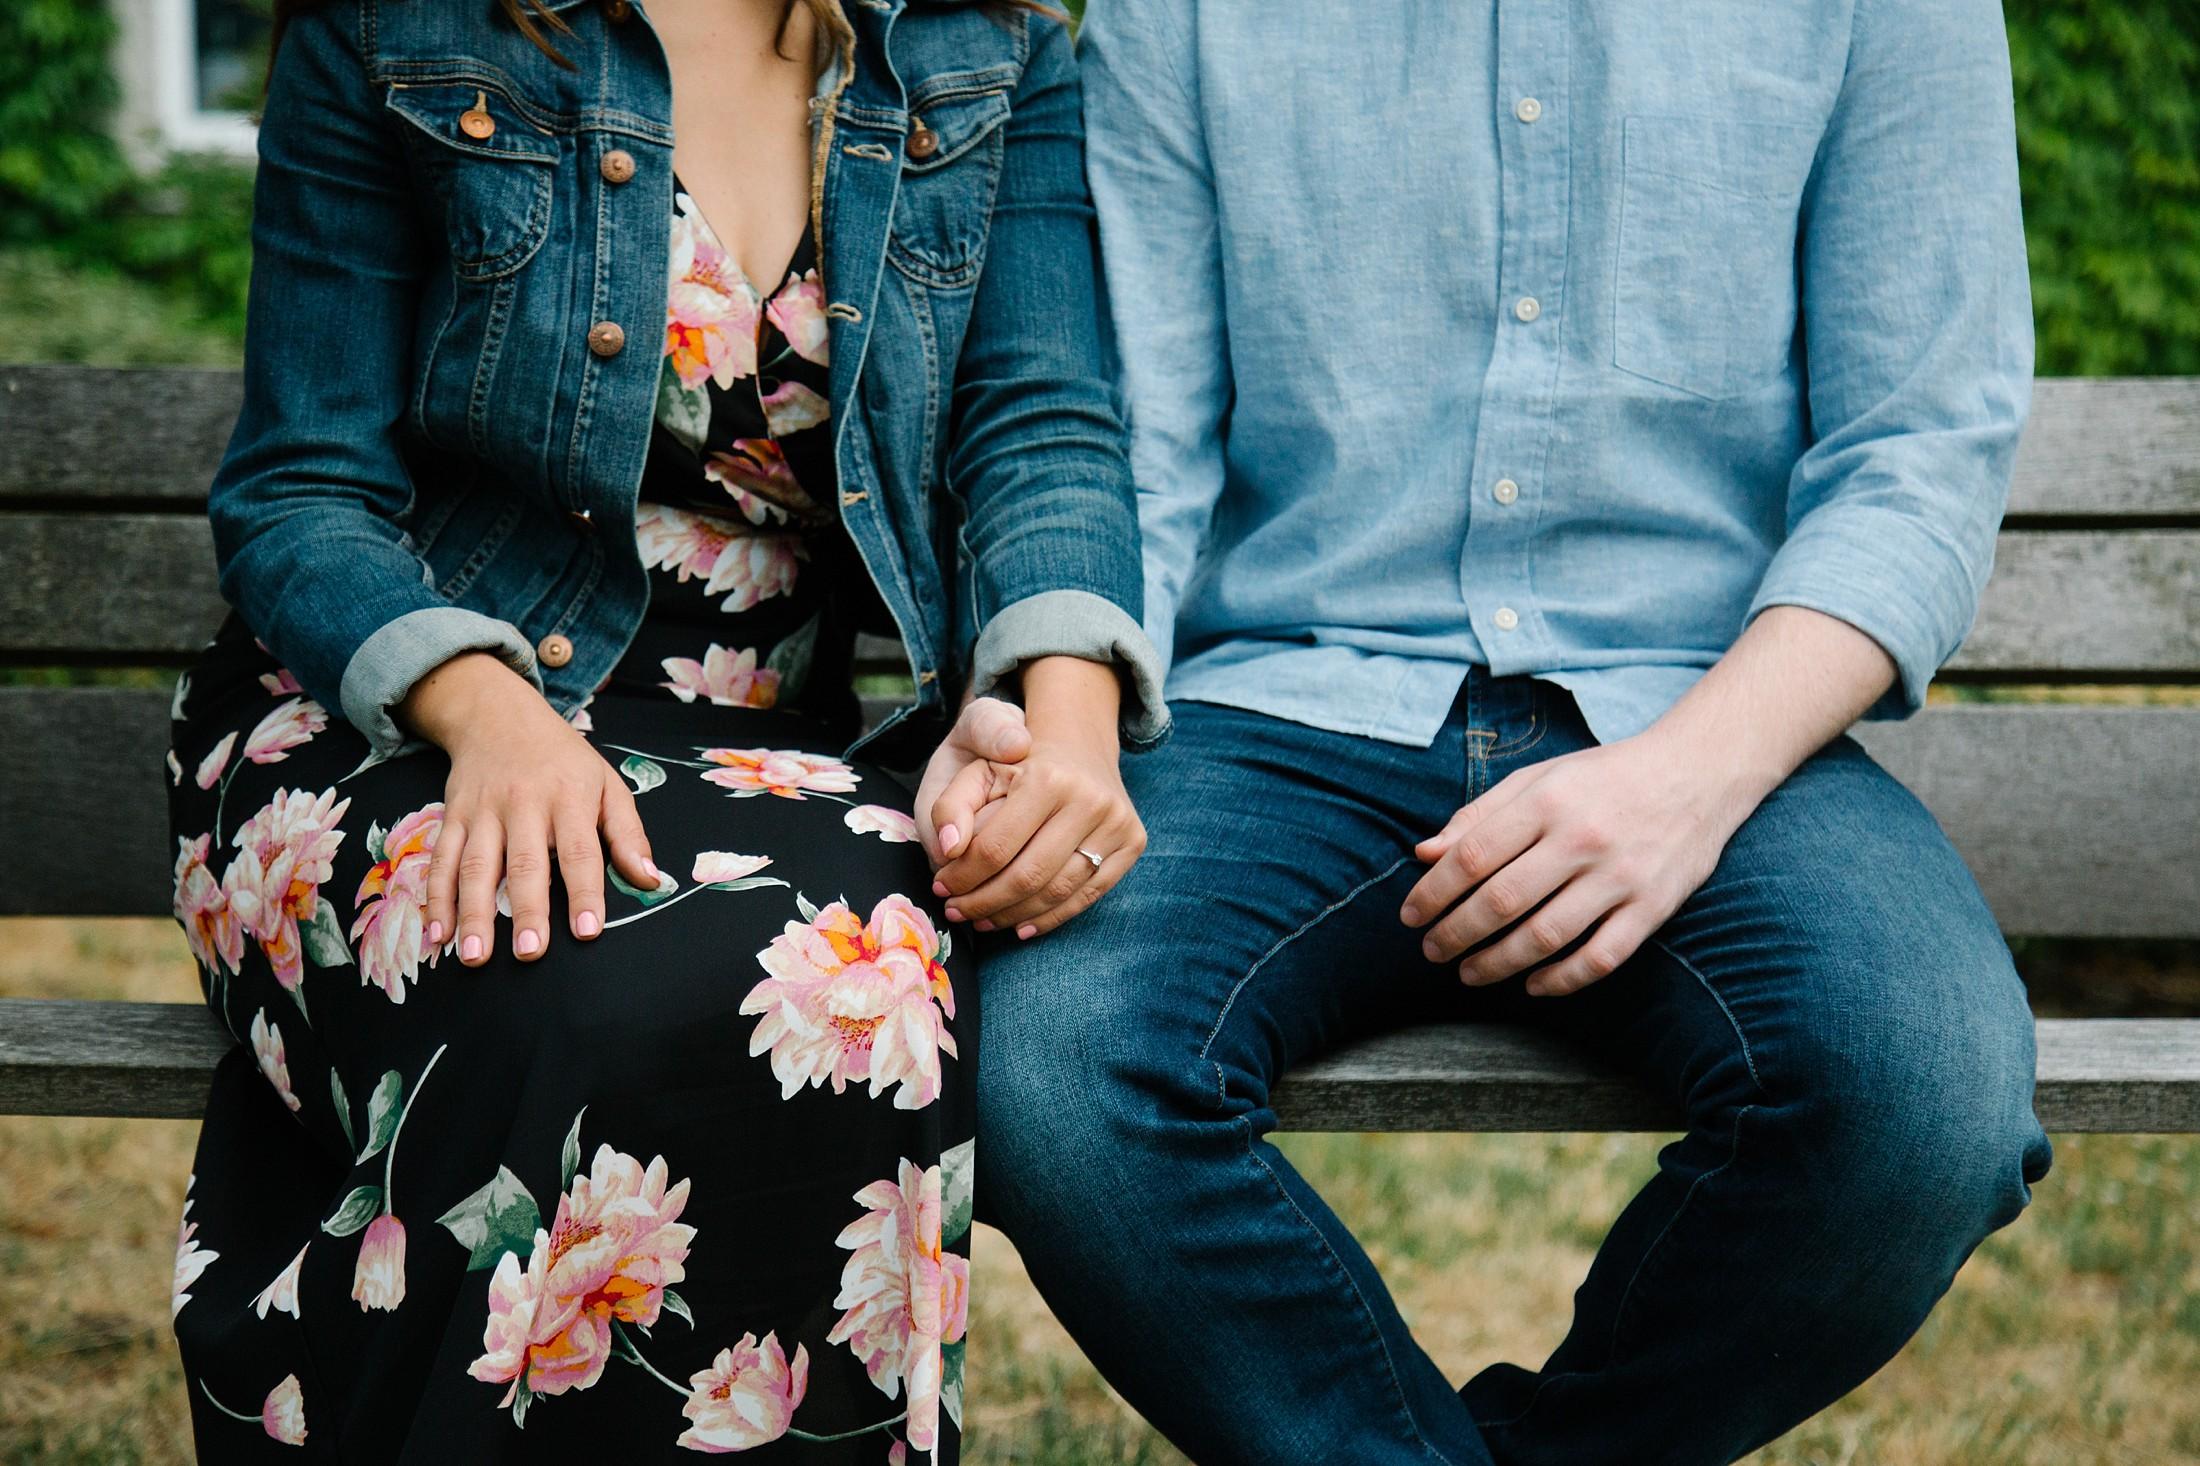 June2.CaroGeorge12980_Note Photography Nelms Documentary Photographer Wedding Photos Engagement Session UBC Rose Garden Jericho Beach Spanish Banks Engagement.jpg